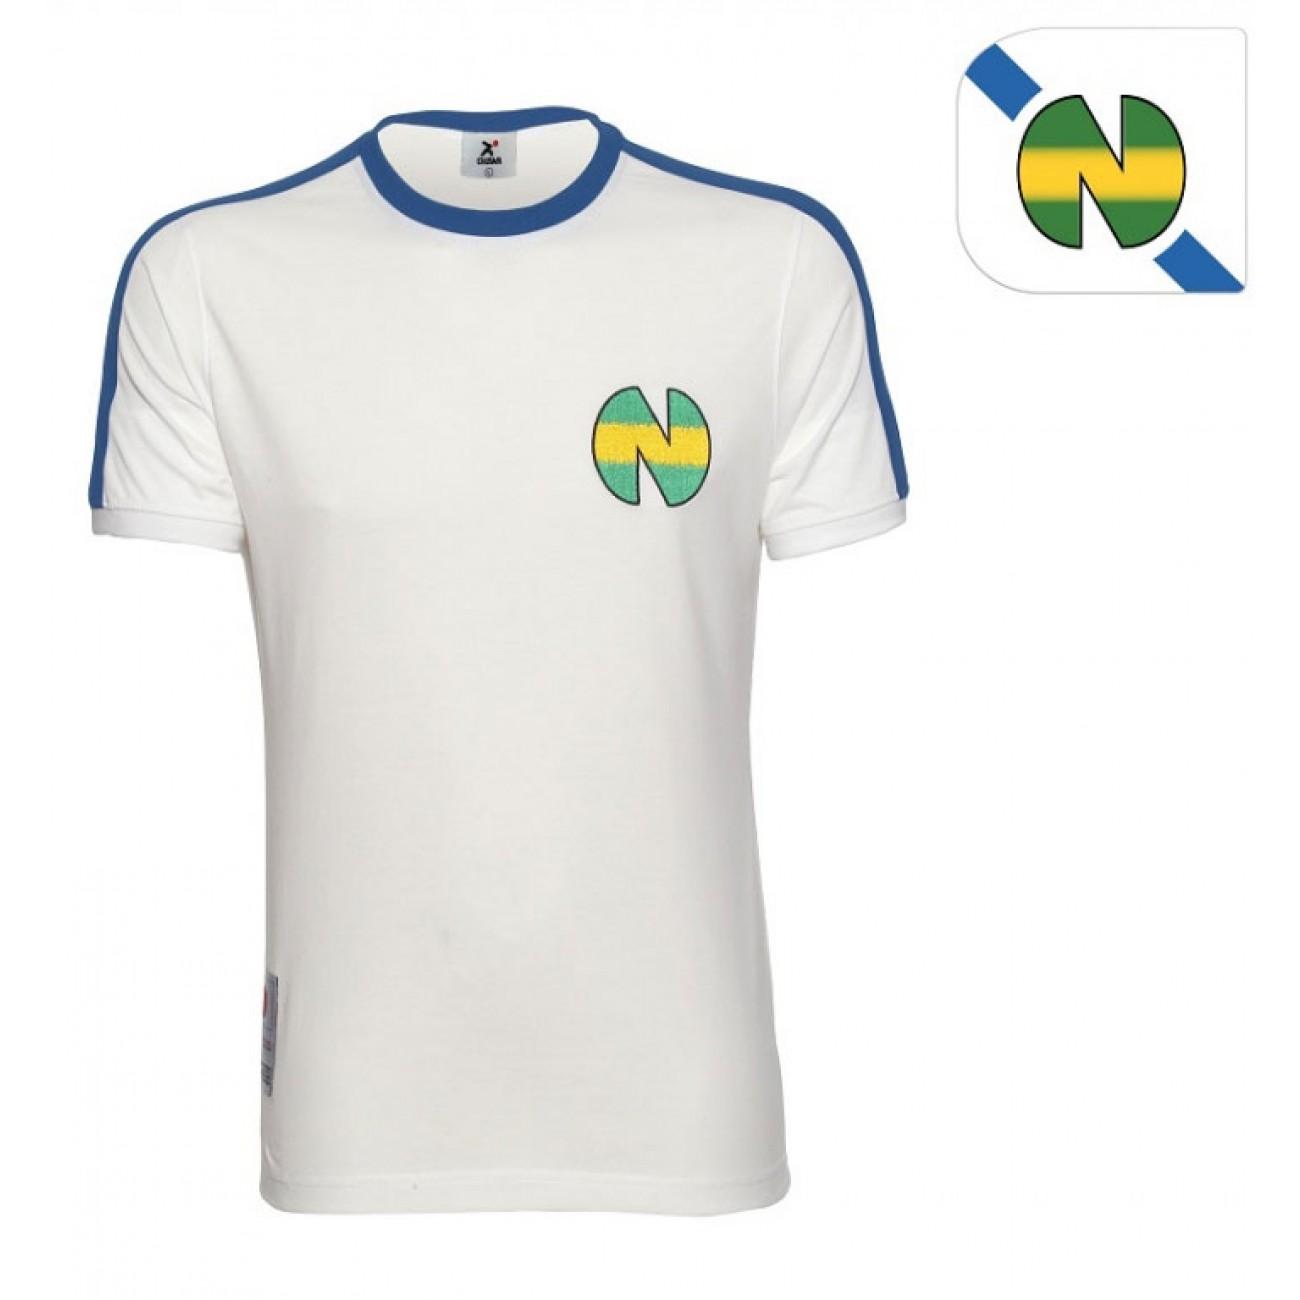 http://www.retrofootball.es/ropa-de-futbol/camiseta-new-team-1984.html